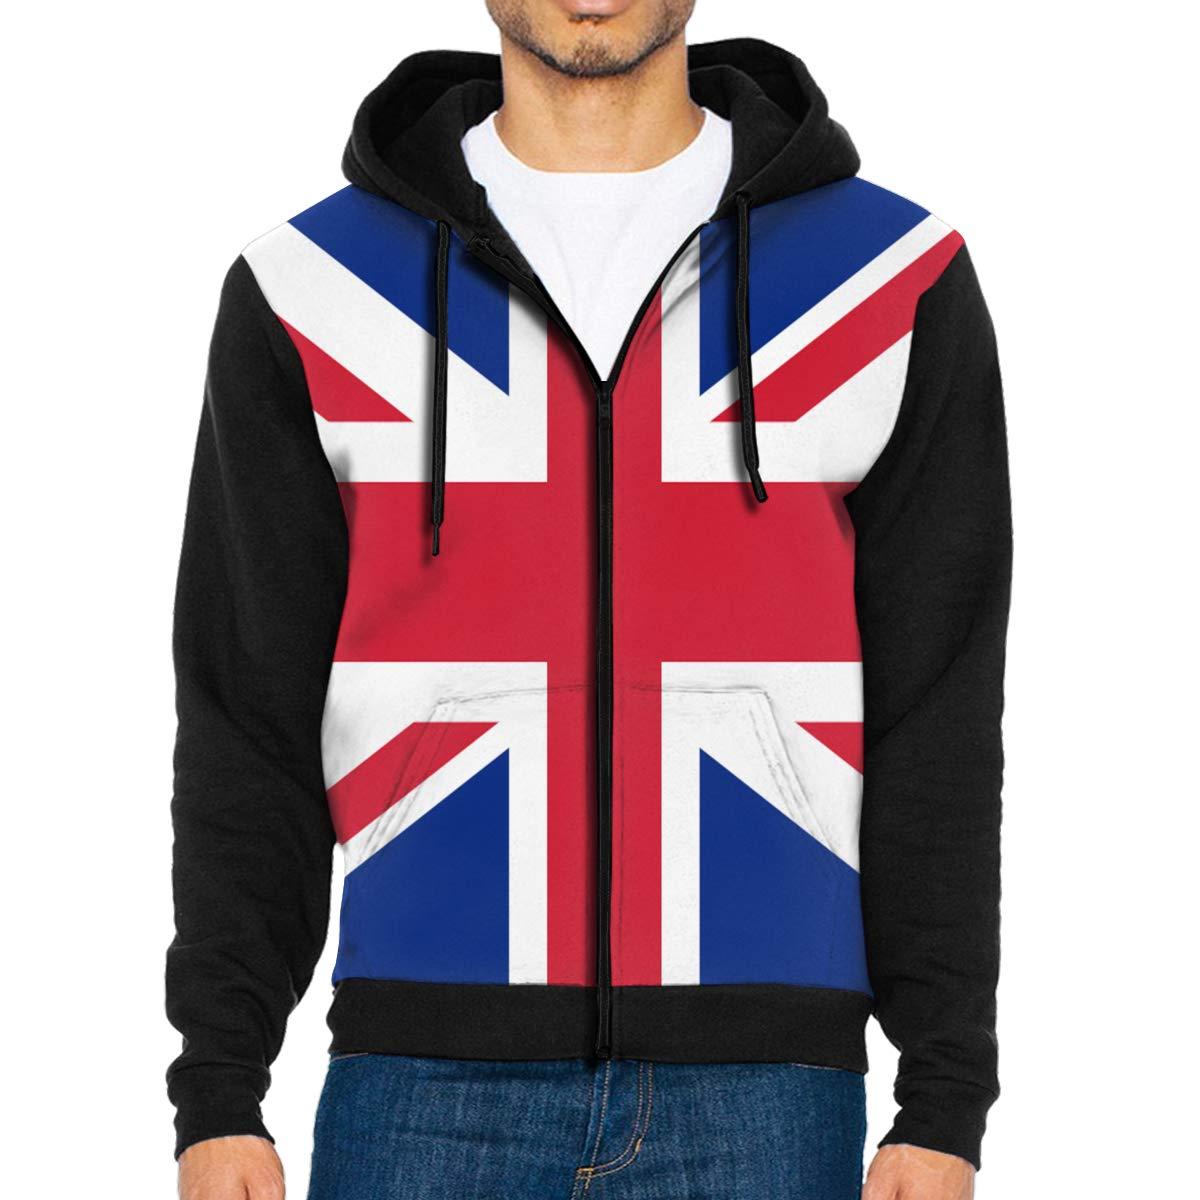 HEHE TAN Mens Pullover Hood British Flag Zip Hoodies Hooded Casual Jackets Coats